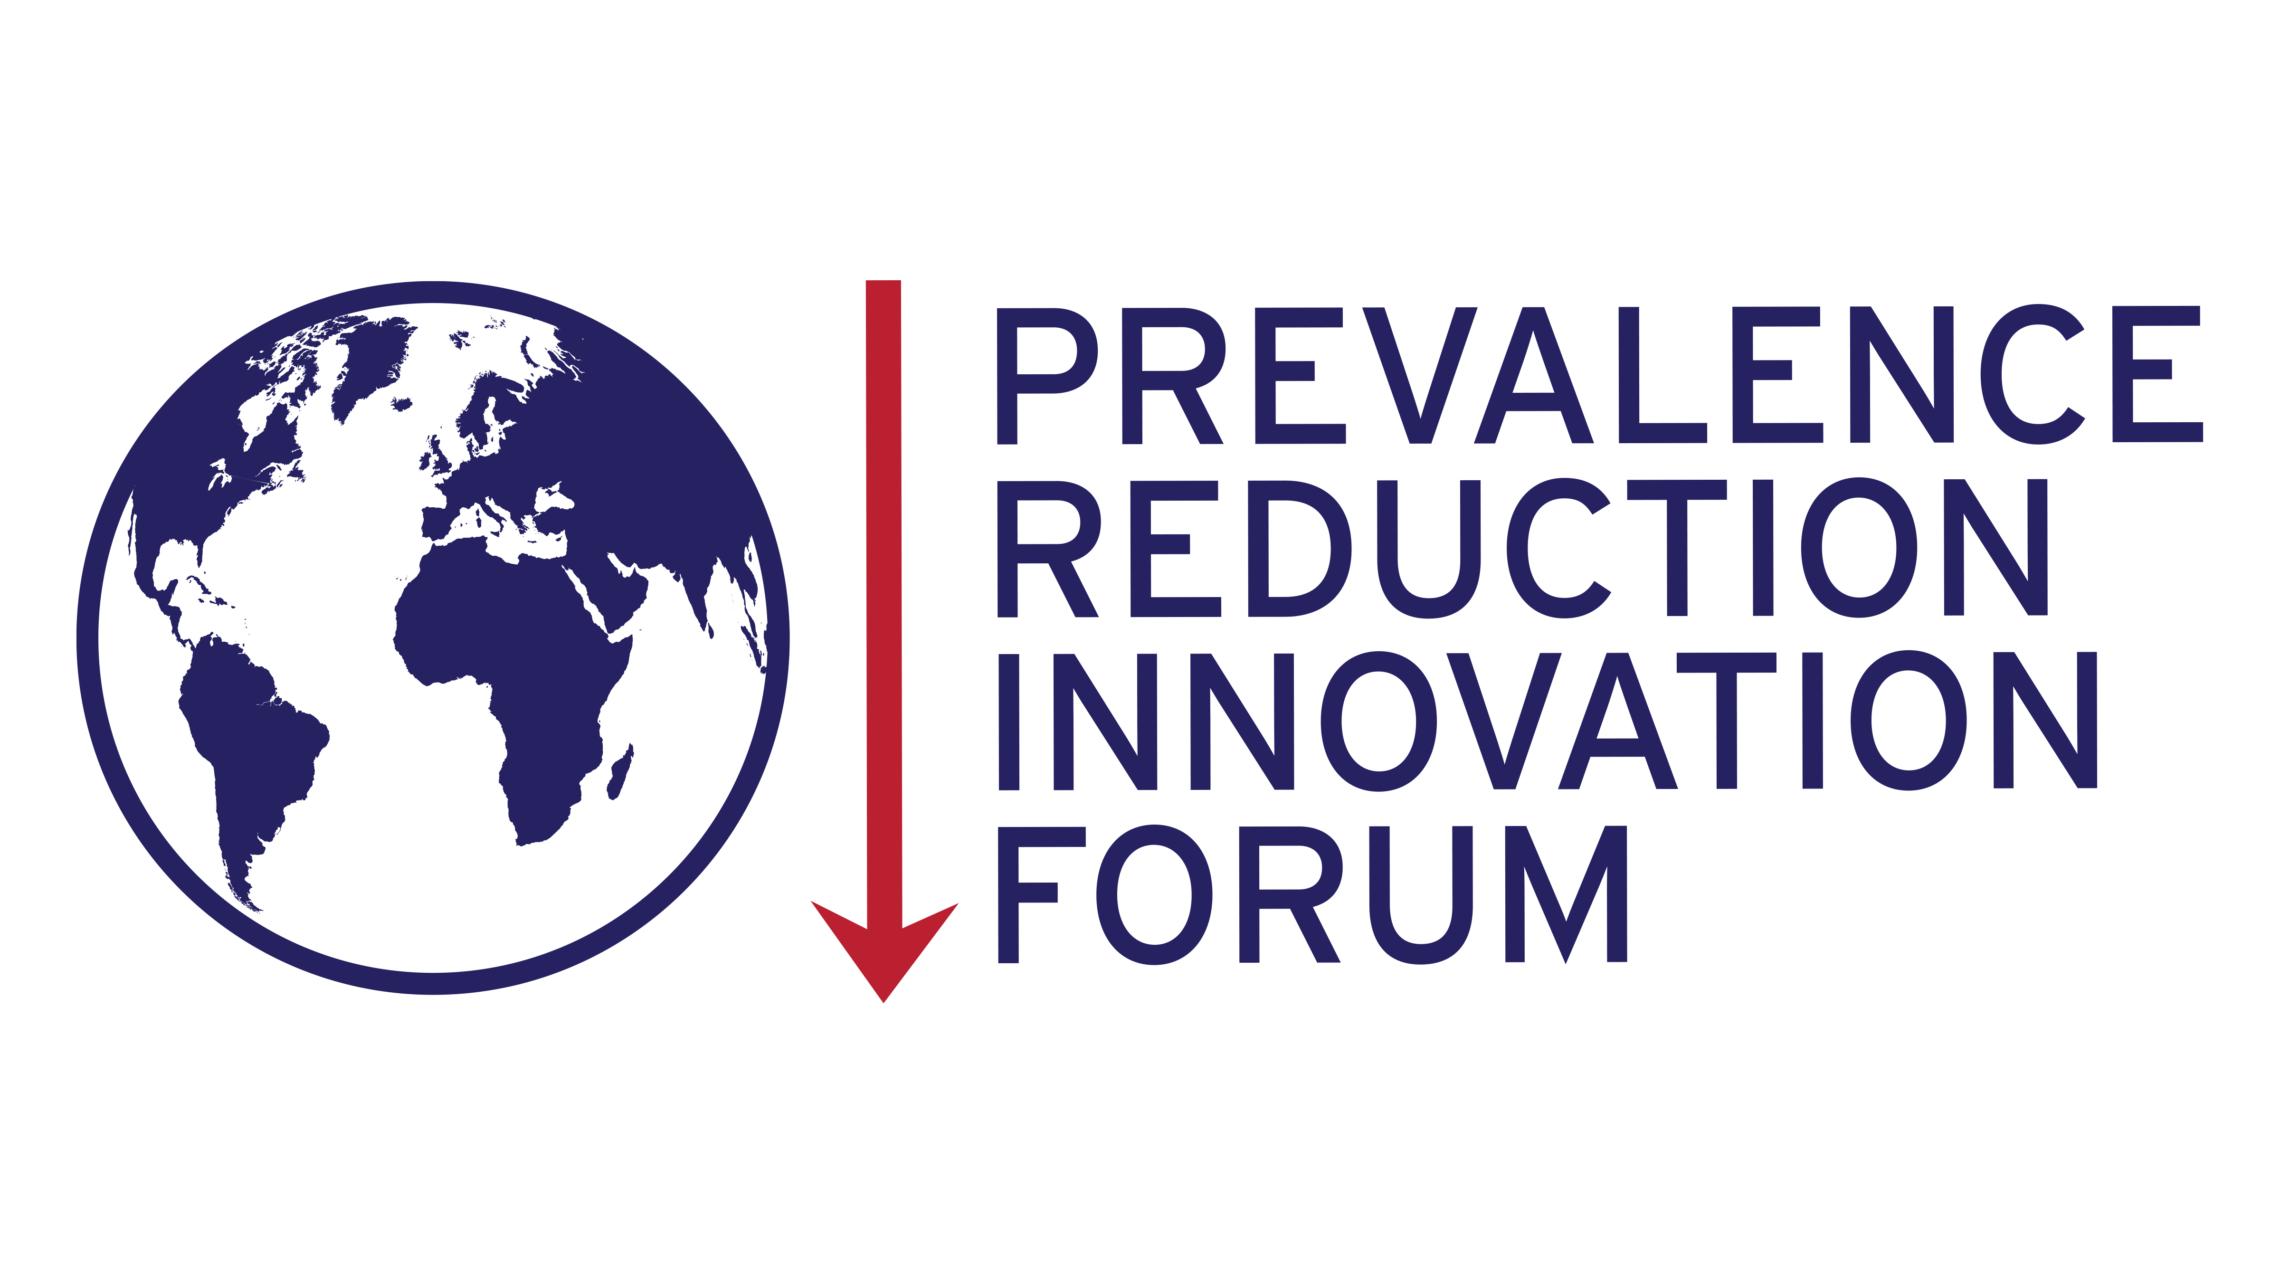 Prevalence Reduction Innovation Forum